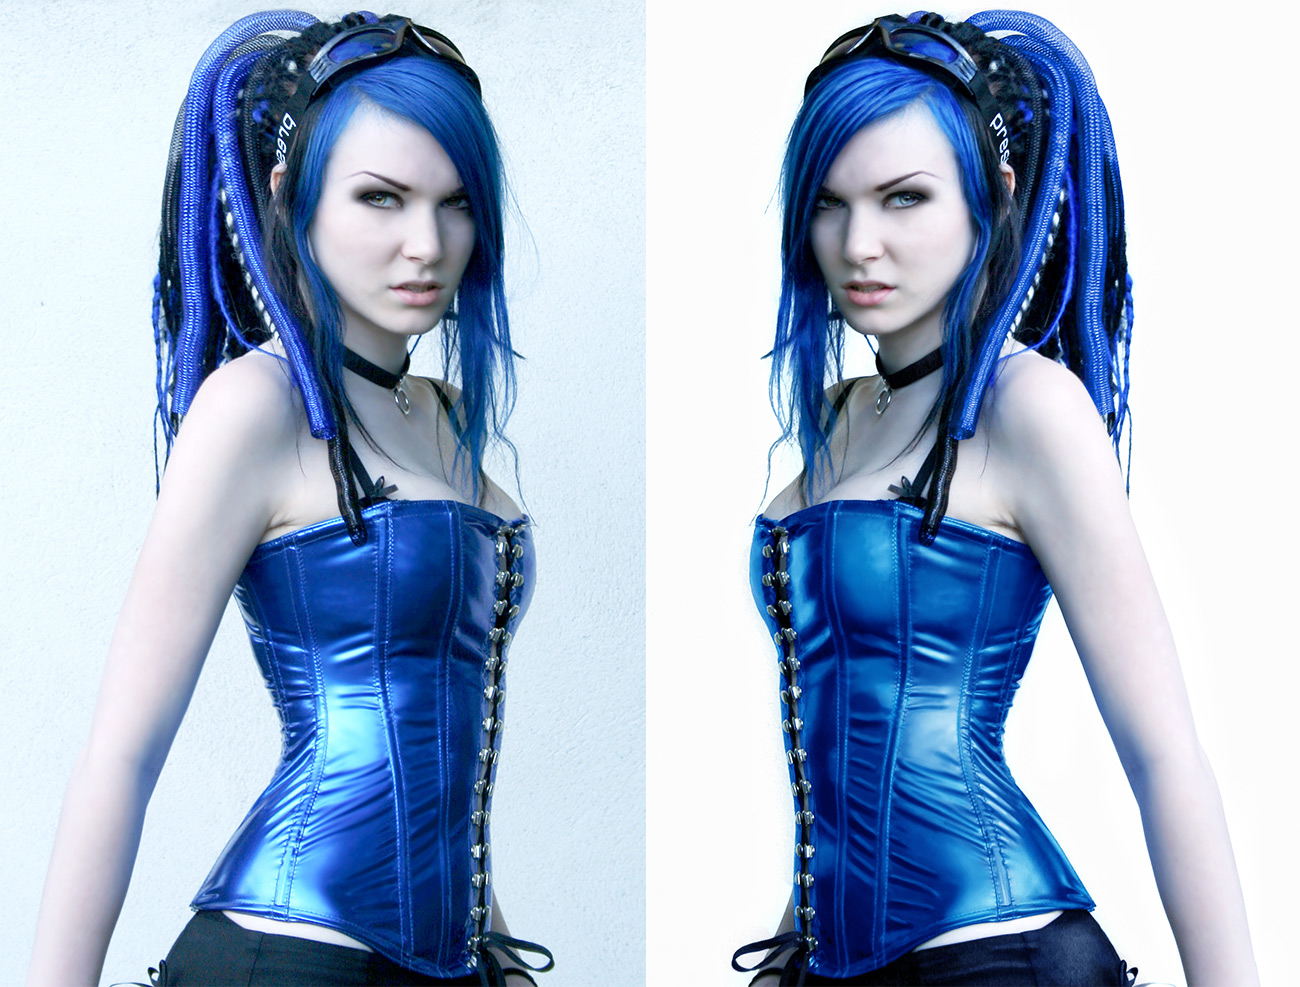 Blau zu Blau